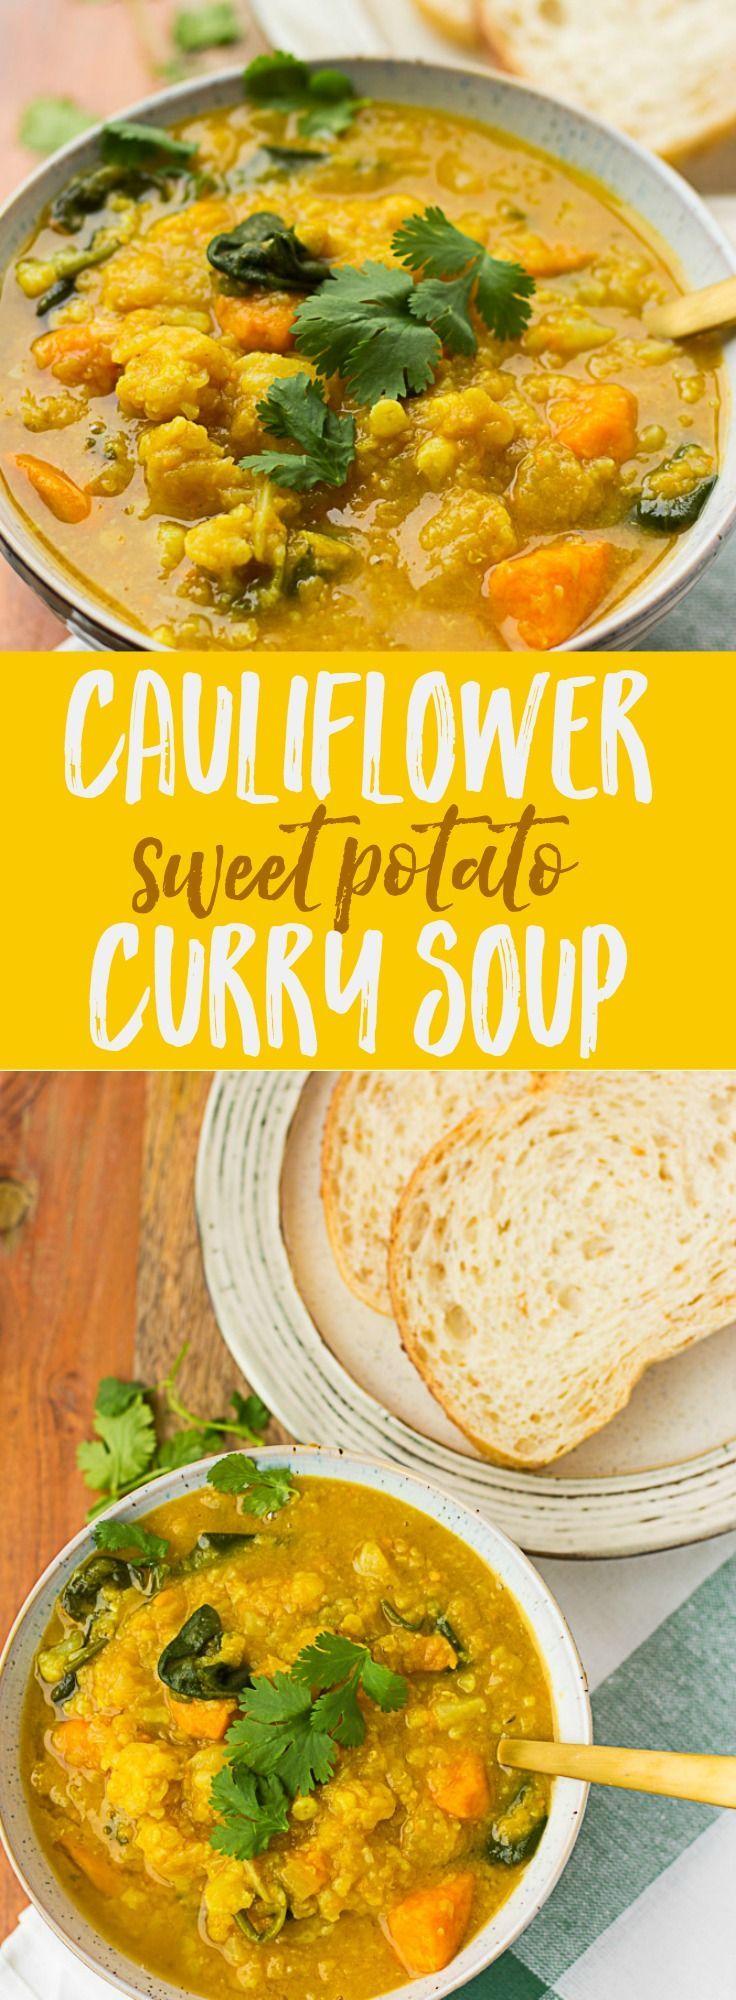 Cauliflower Sweet Potato Curry Soup   Vegan/Gluten-free   Nora Cooks